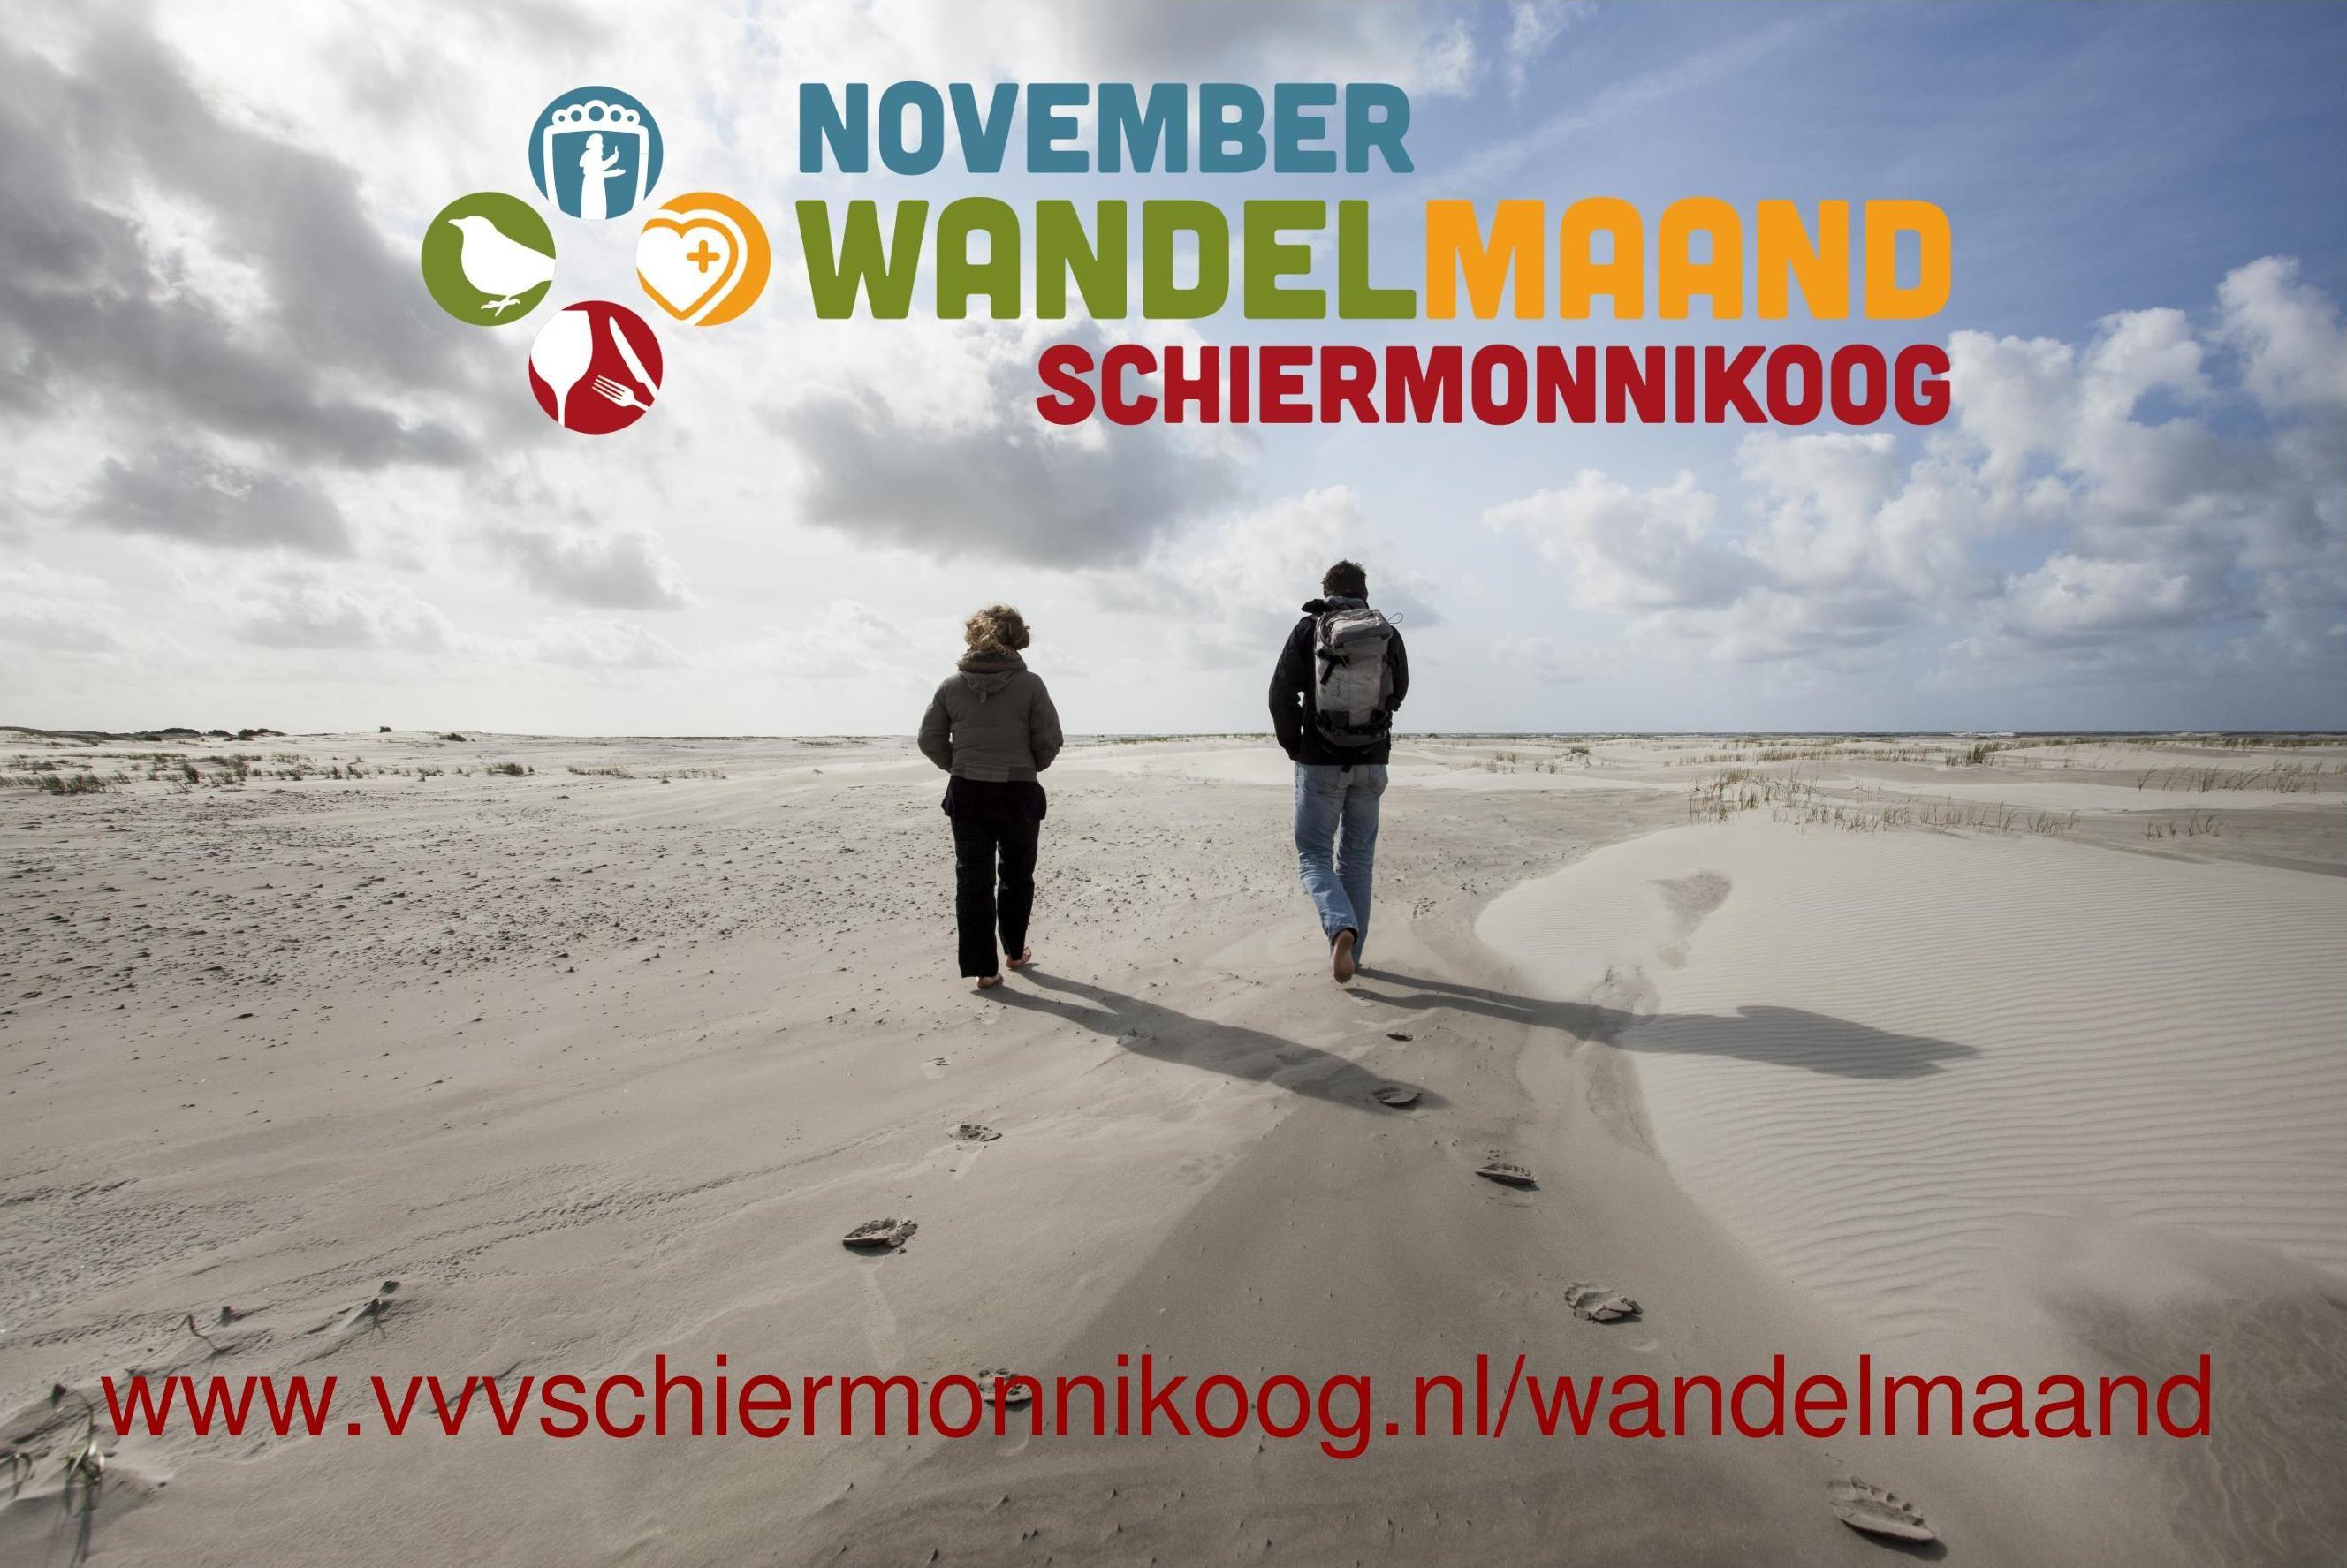 Schiermonnikoog november Wandelmaand